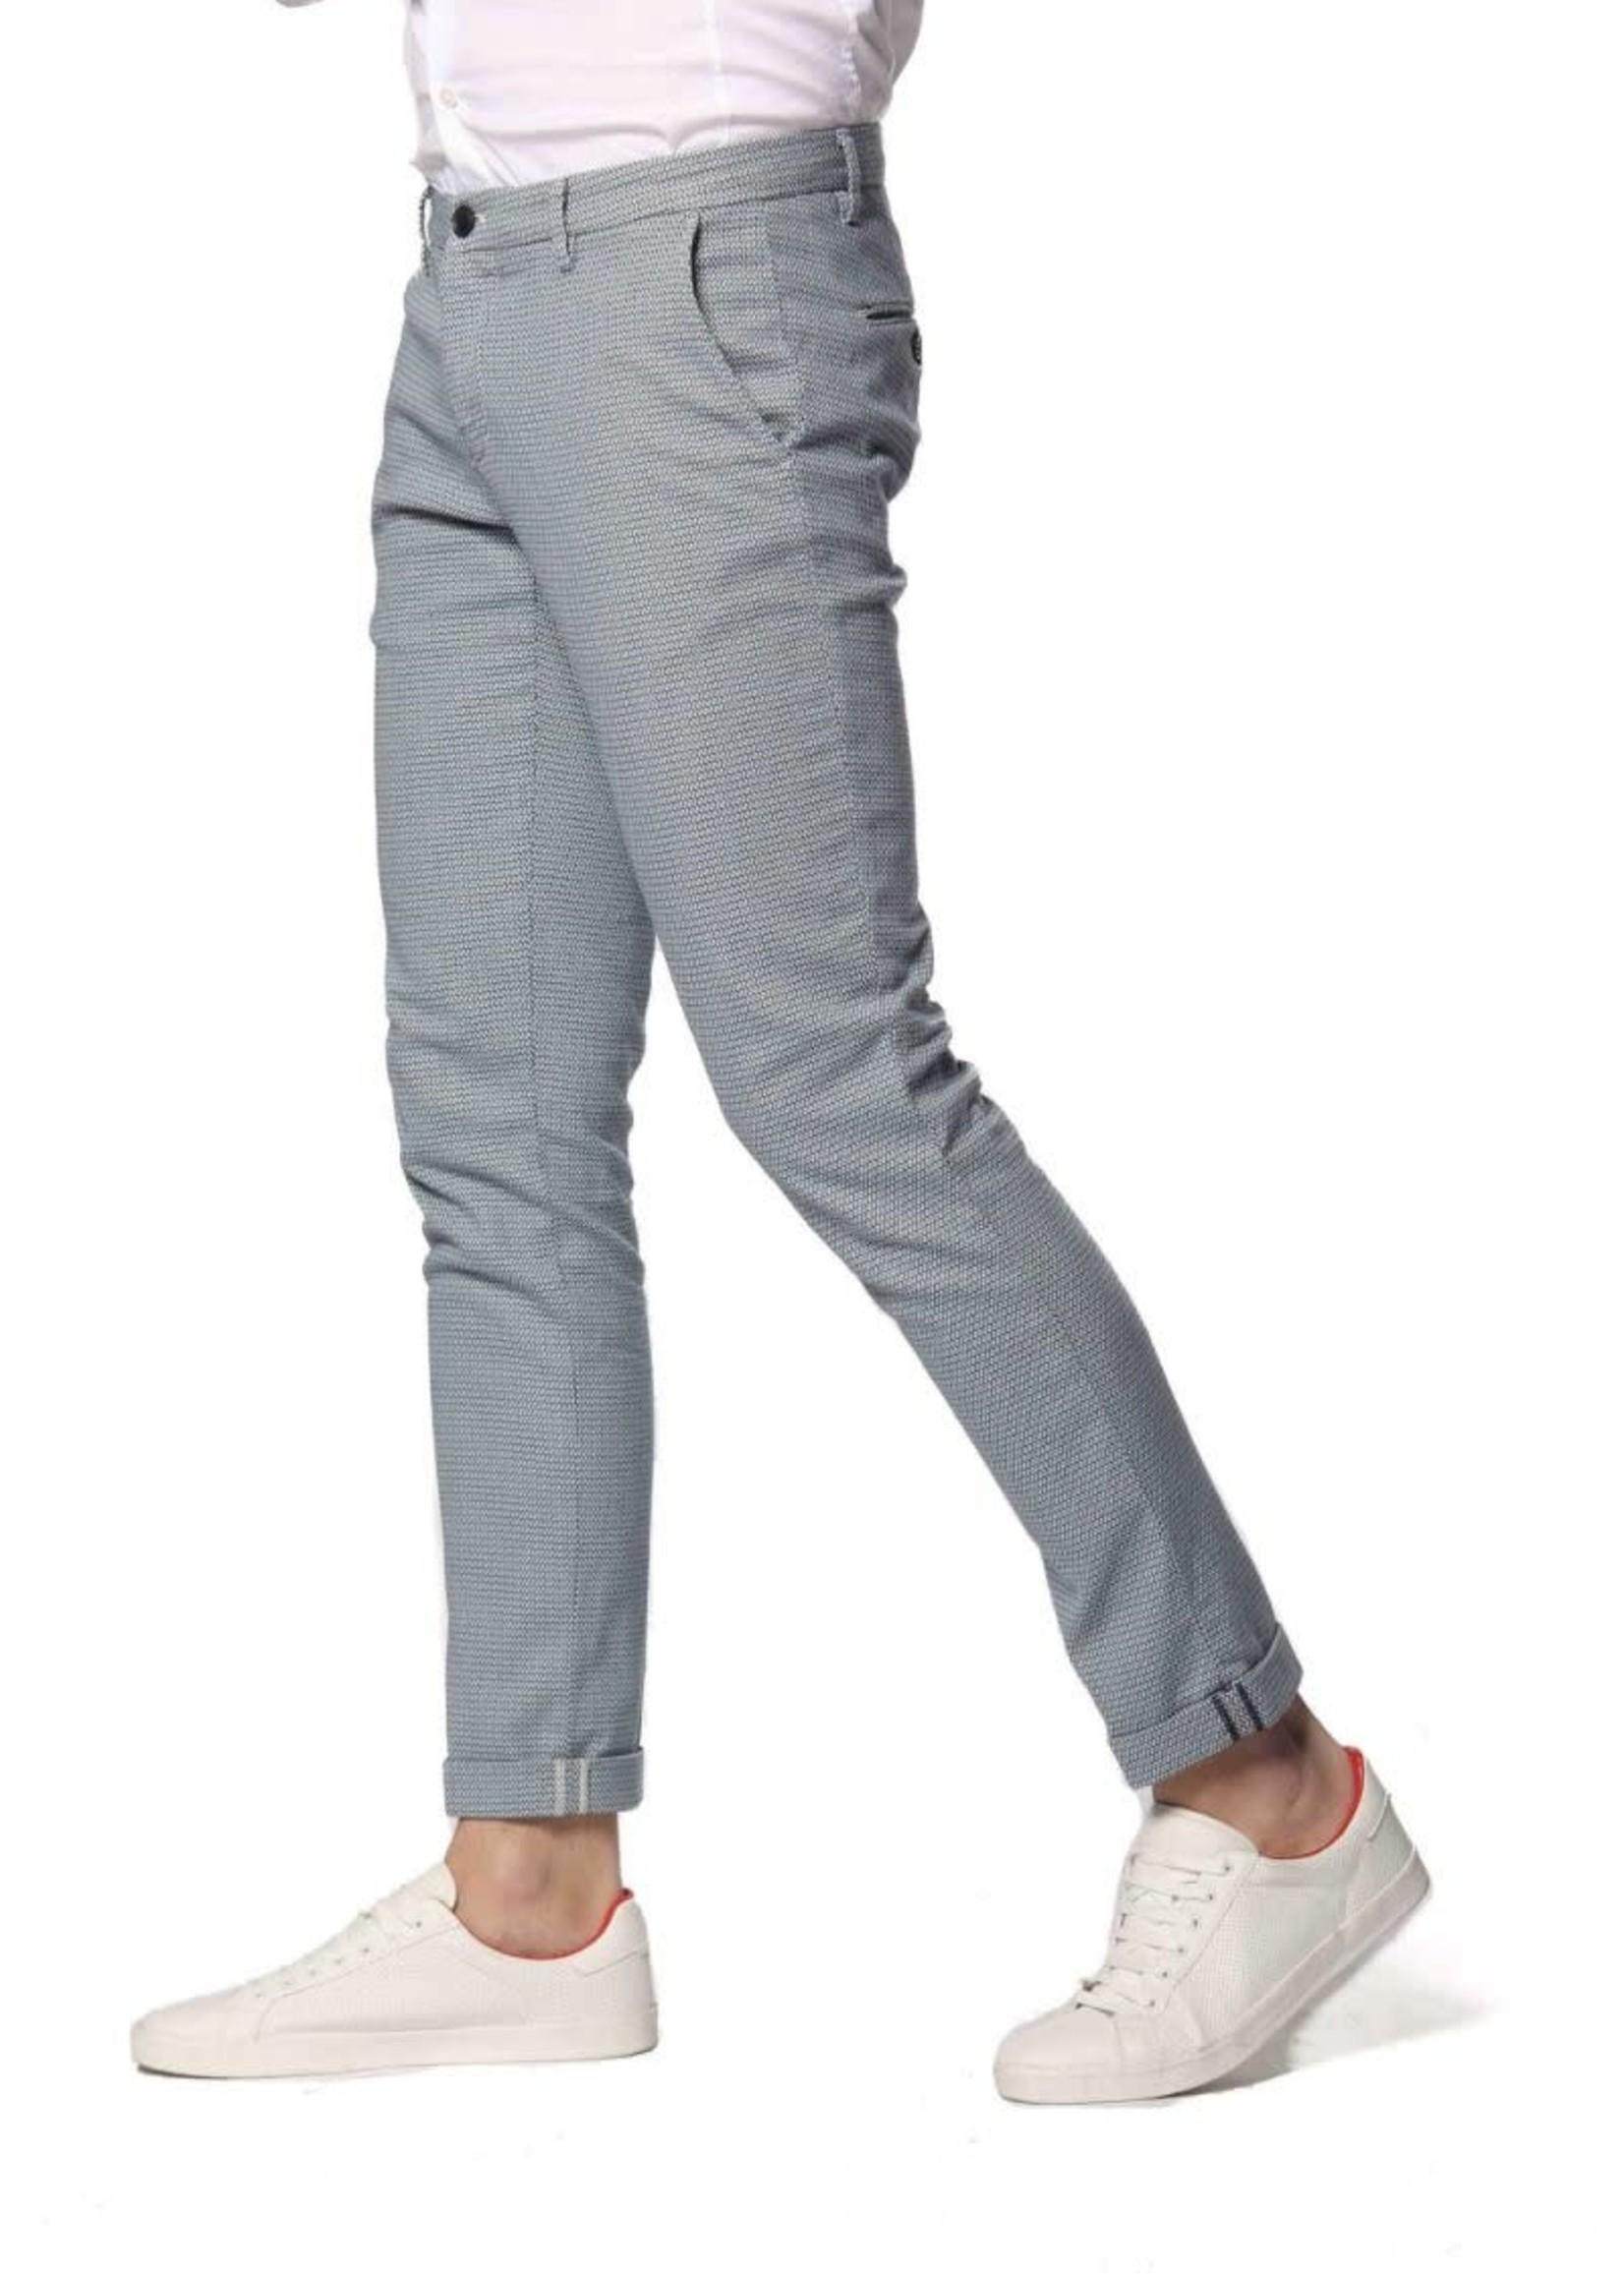 Mason's Pants printed jacquard extra slim fit Milano Style | Blue | Mason's